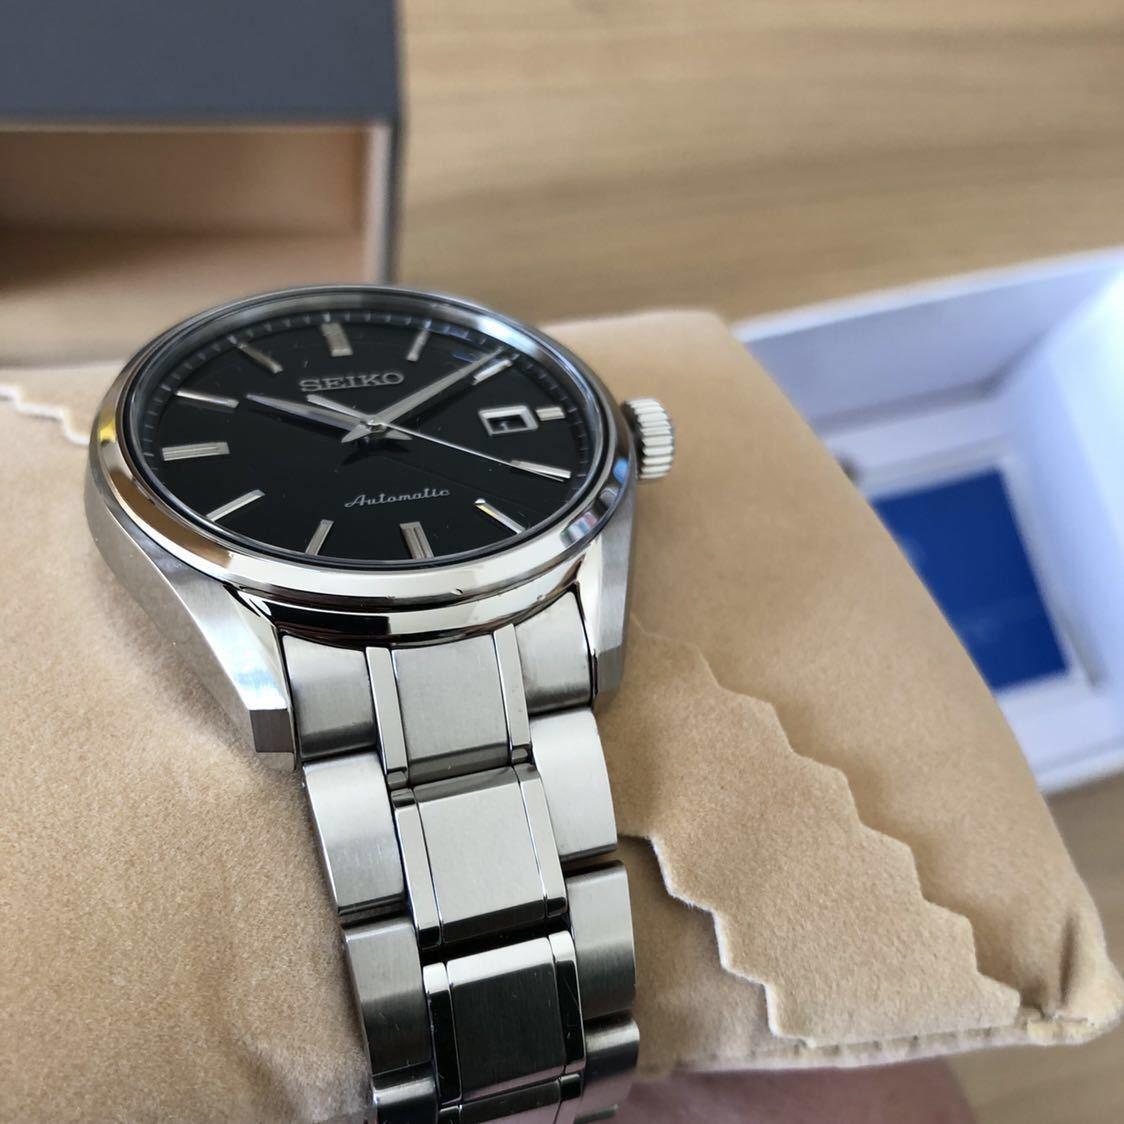 SEIKO PRESAGE SARX035 セイコー プレザージュ 機械式 メカニカル 腕時計 自動巻_画像3